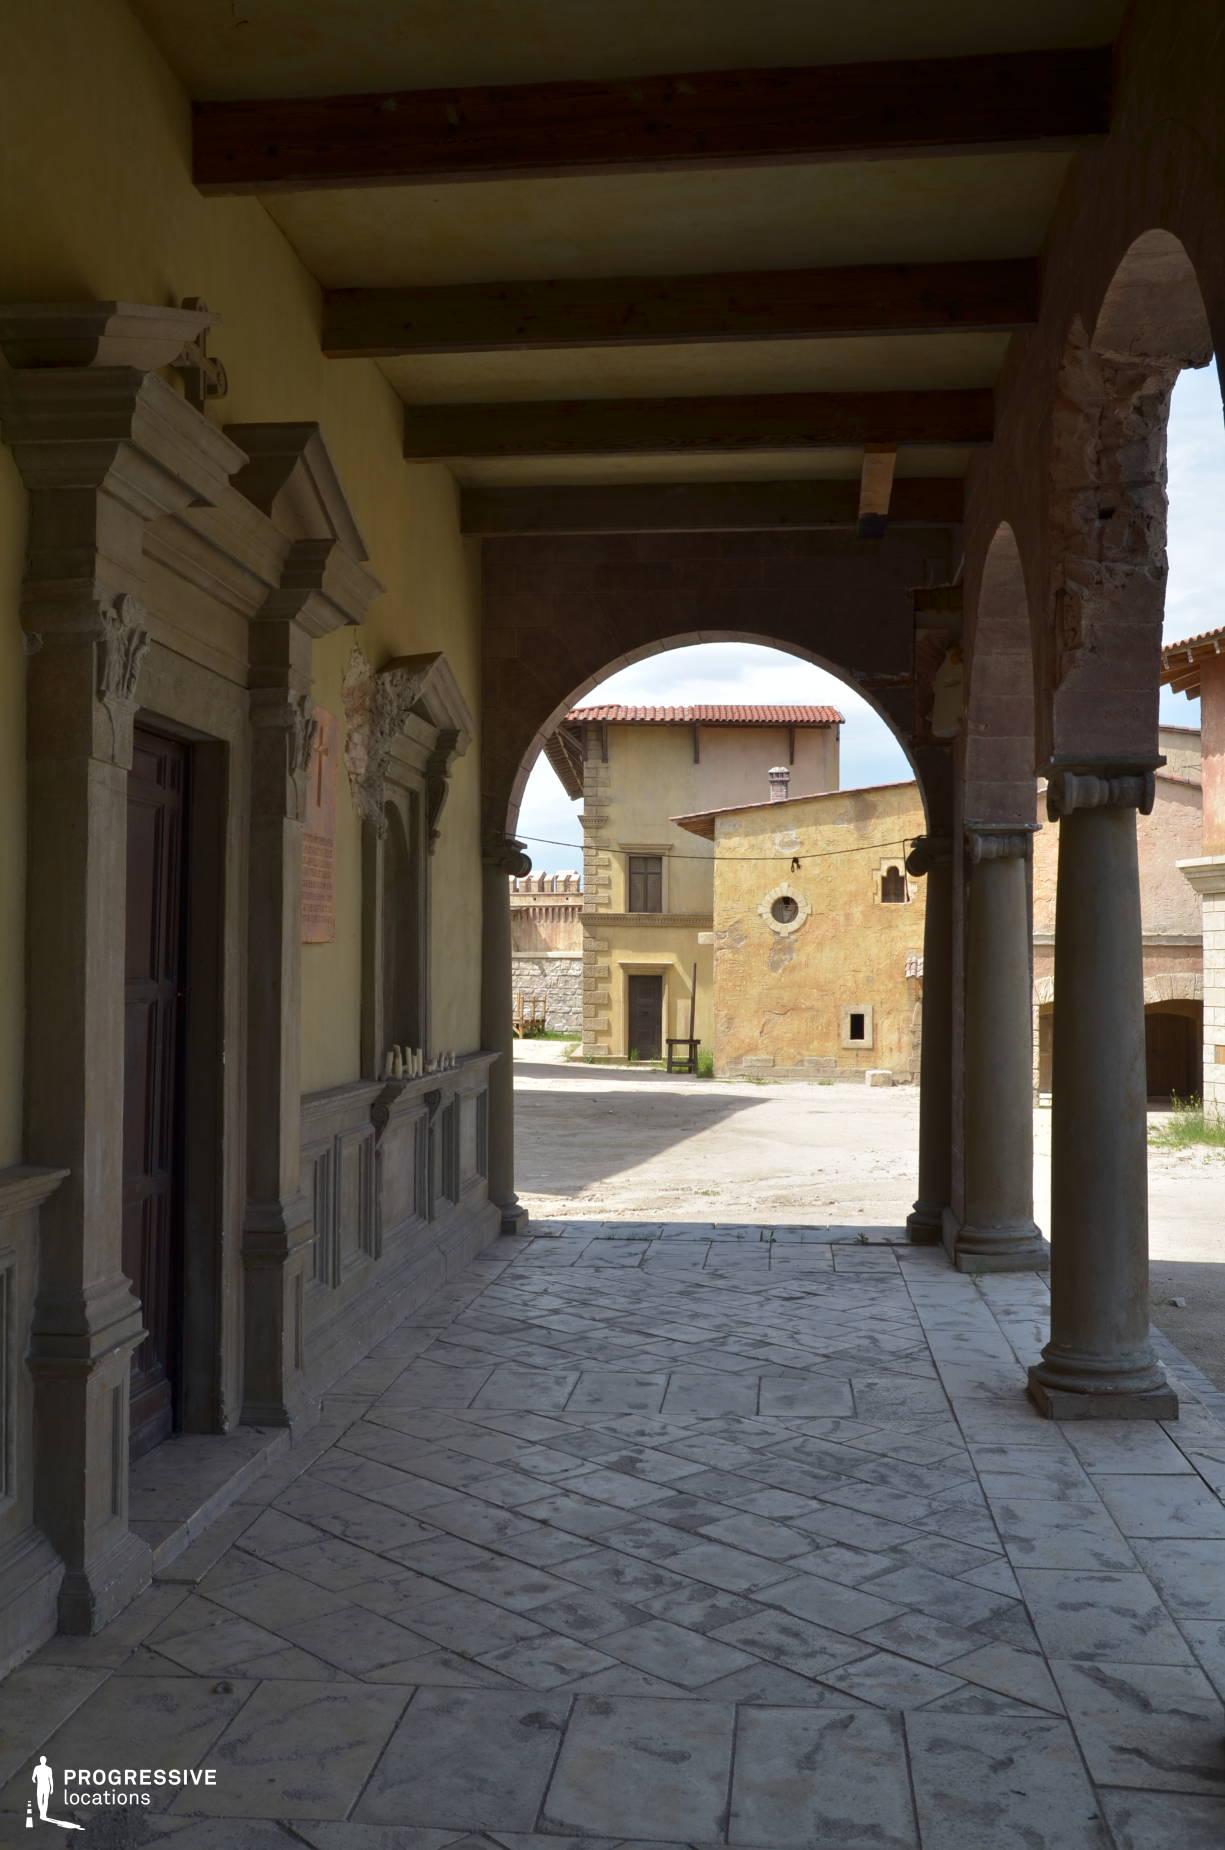 Renaissance City Backlot: Arcade Loggia %26 Entrance